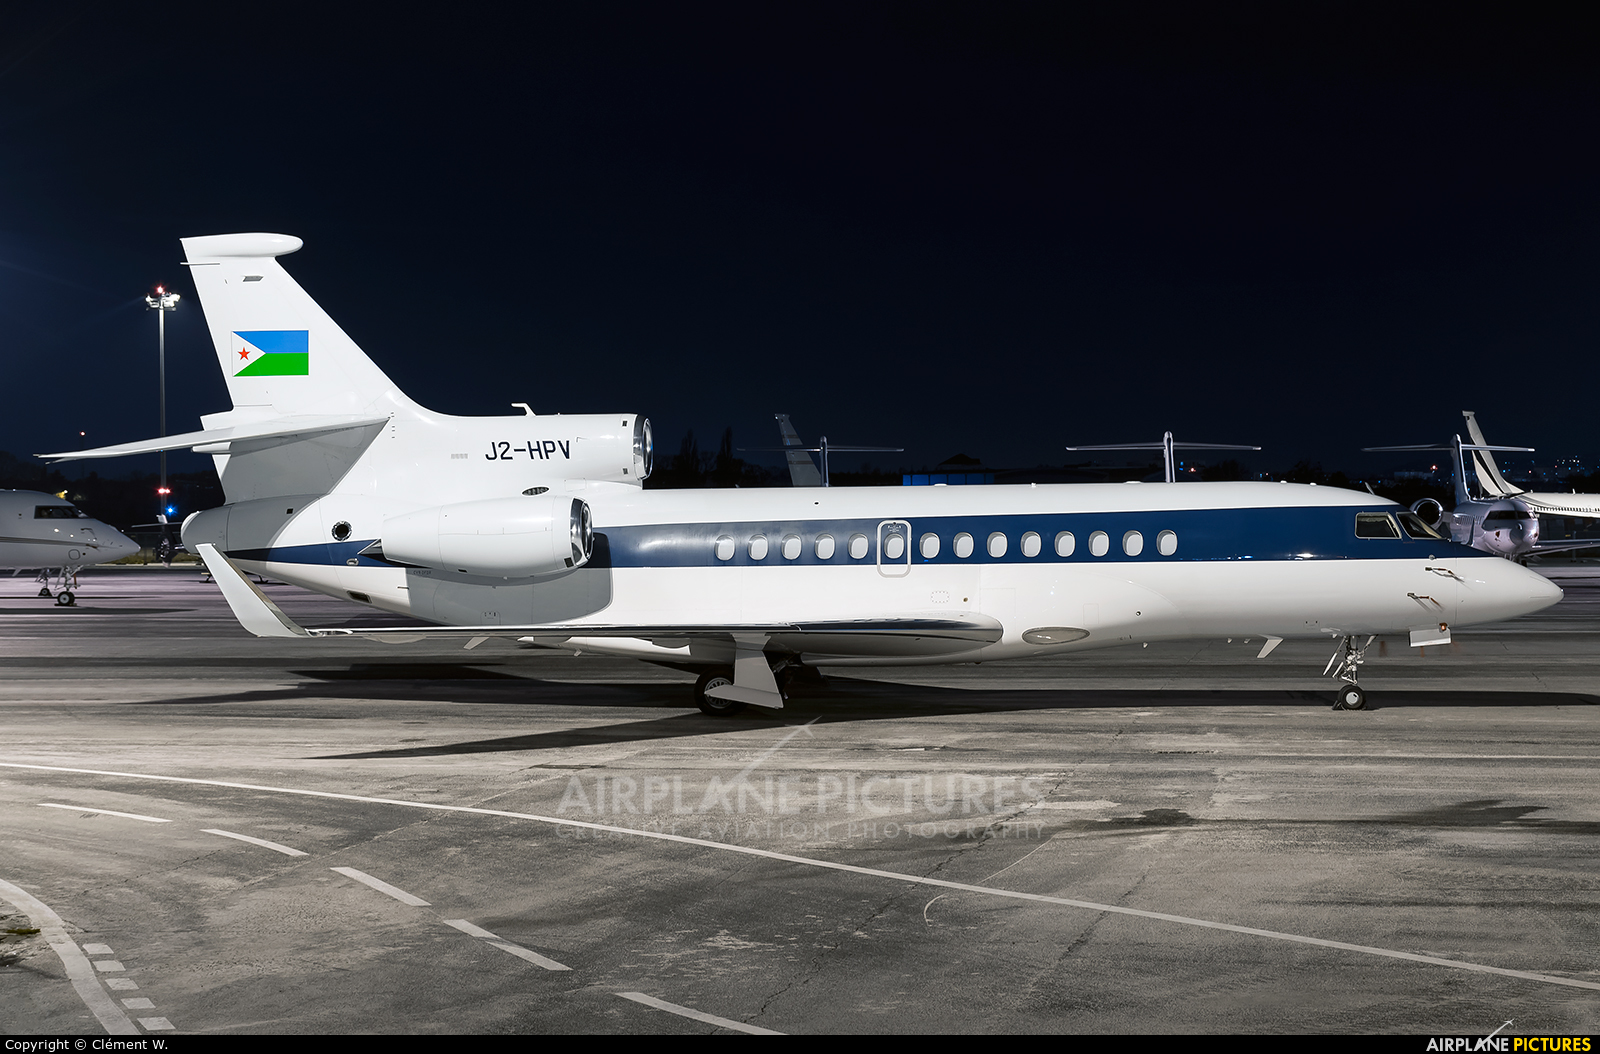 Djibouti - Government J2-HPV aircraft at Paris - Le Bourget